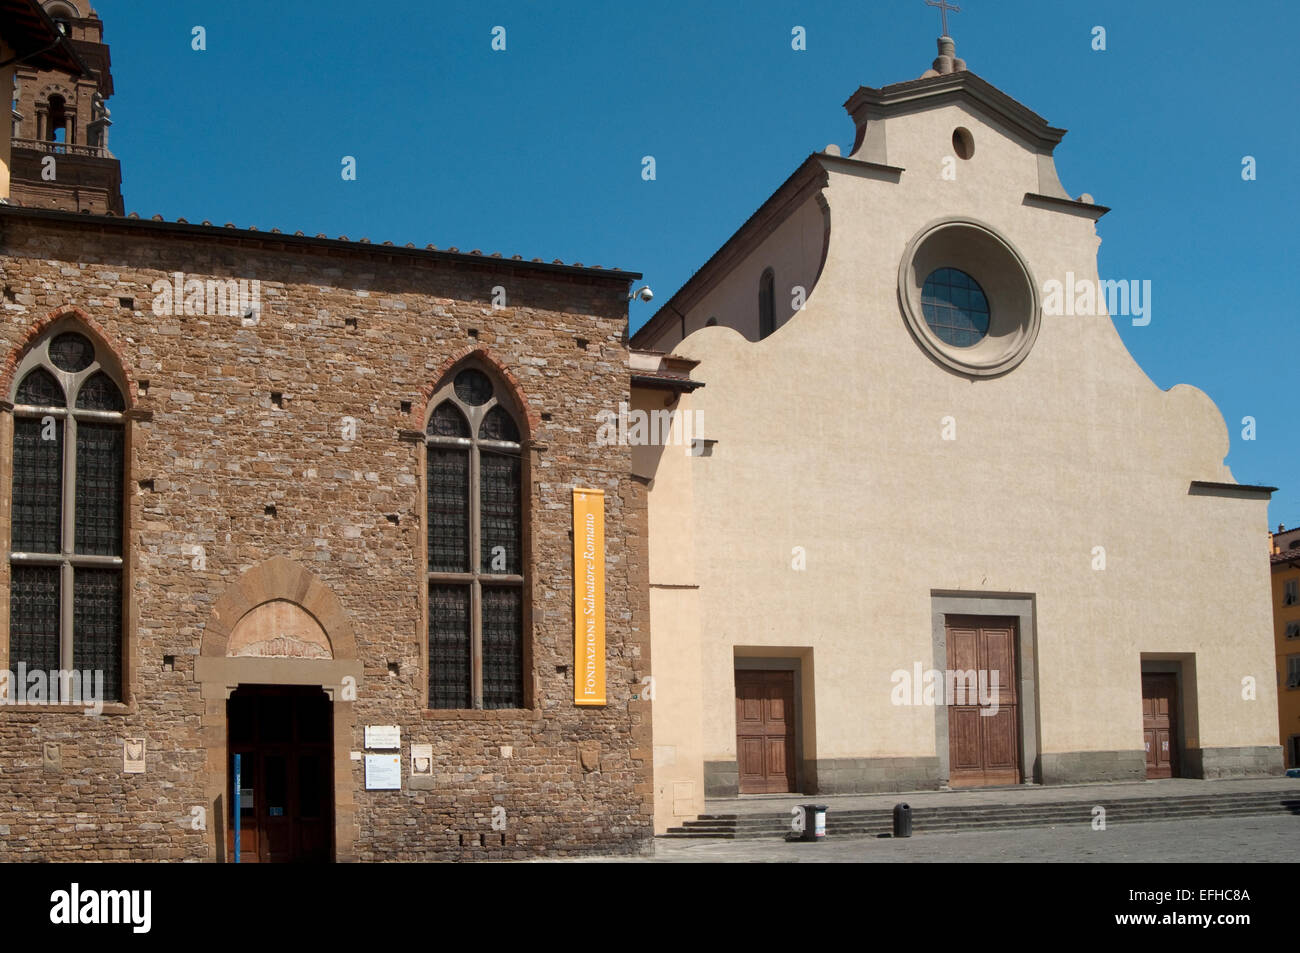 Italy, Tuscany, Florence, Church of Santo Spirito by Brunelleschi Filippo Stock Photo